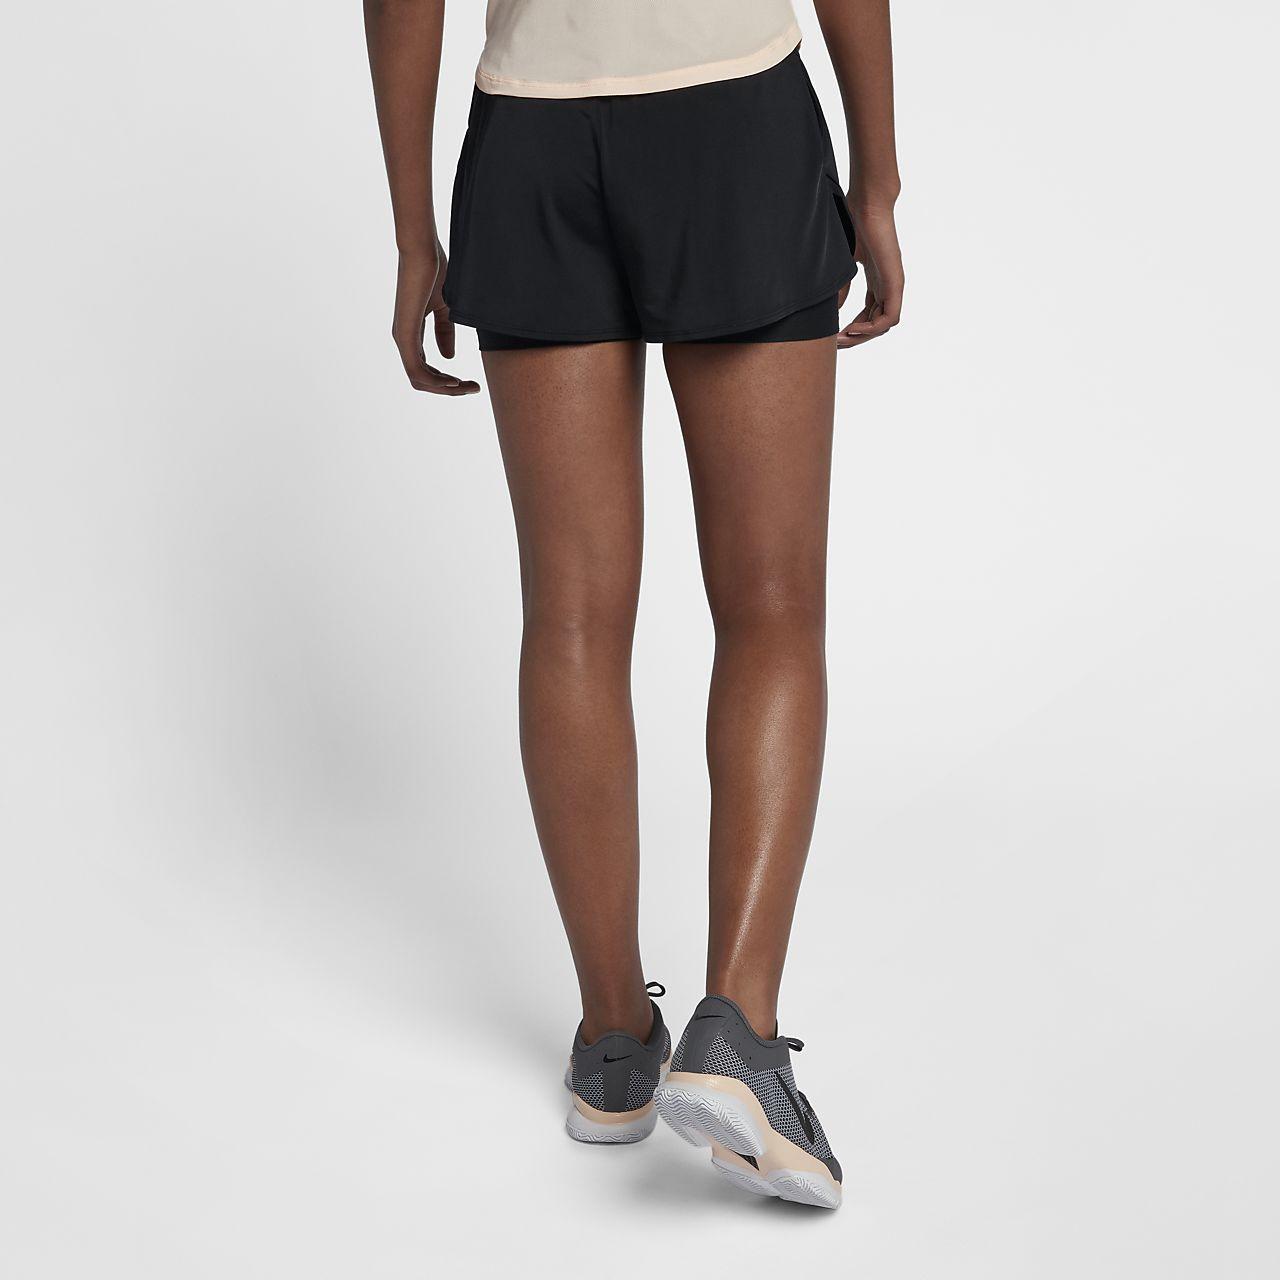 NikeCourt Dri-FIT Ace Women's Tennis Shorts